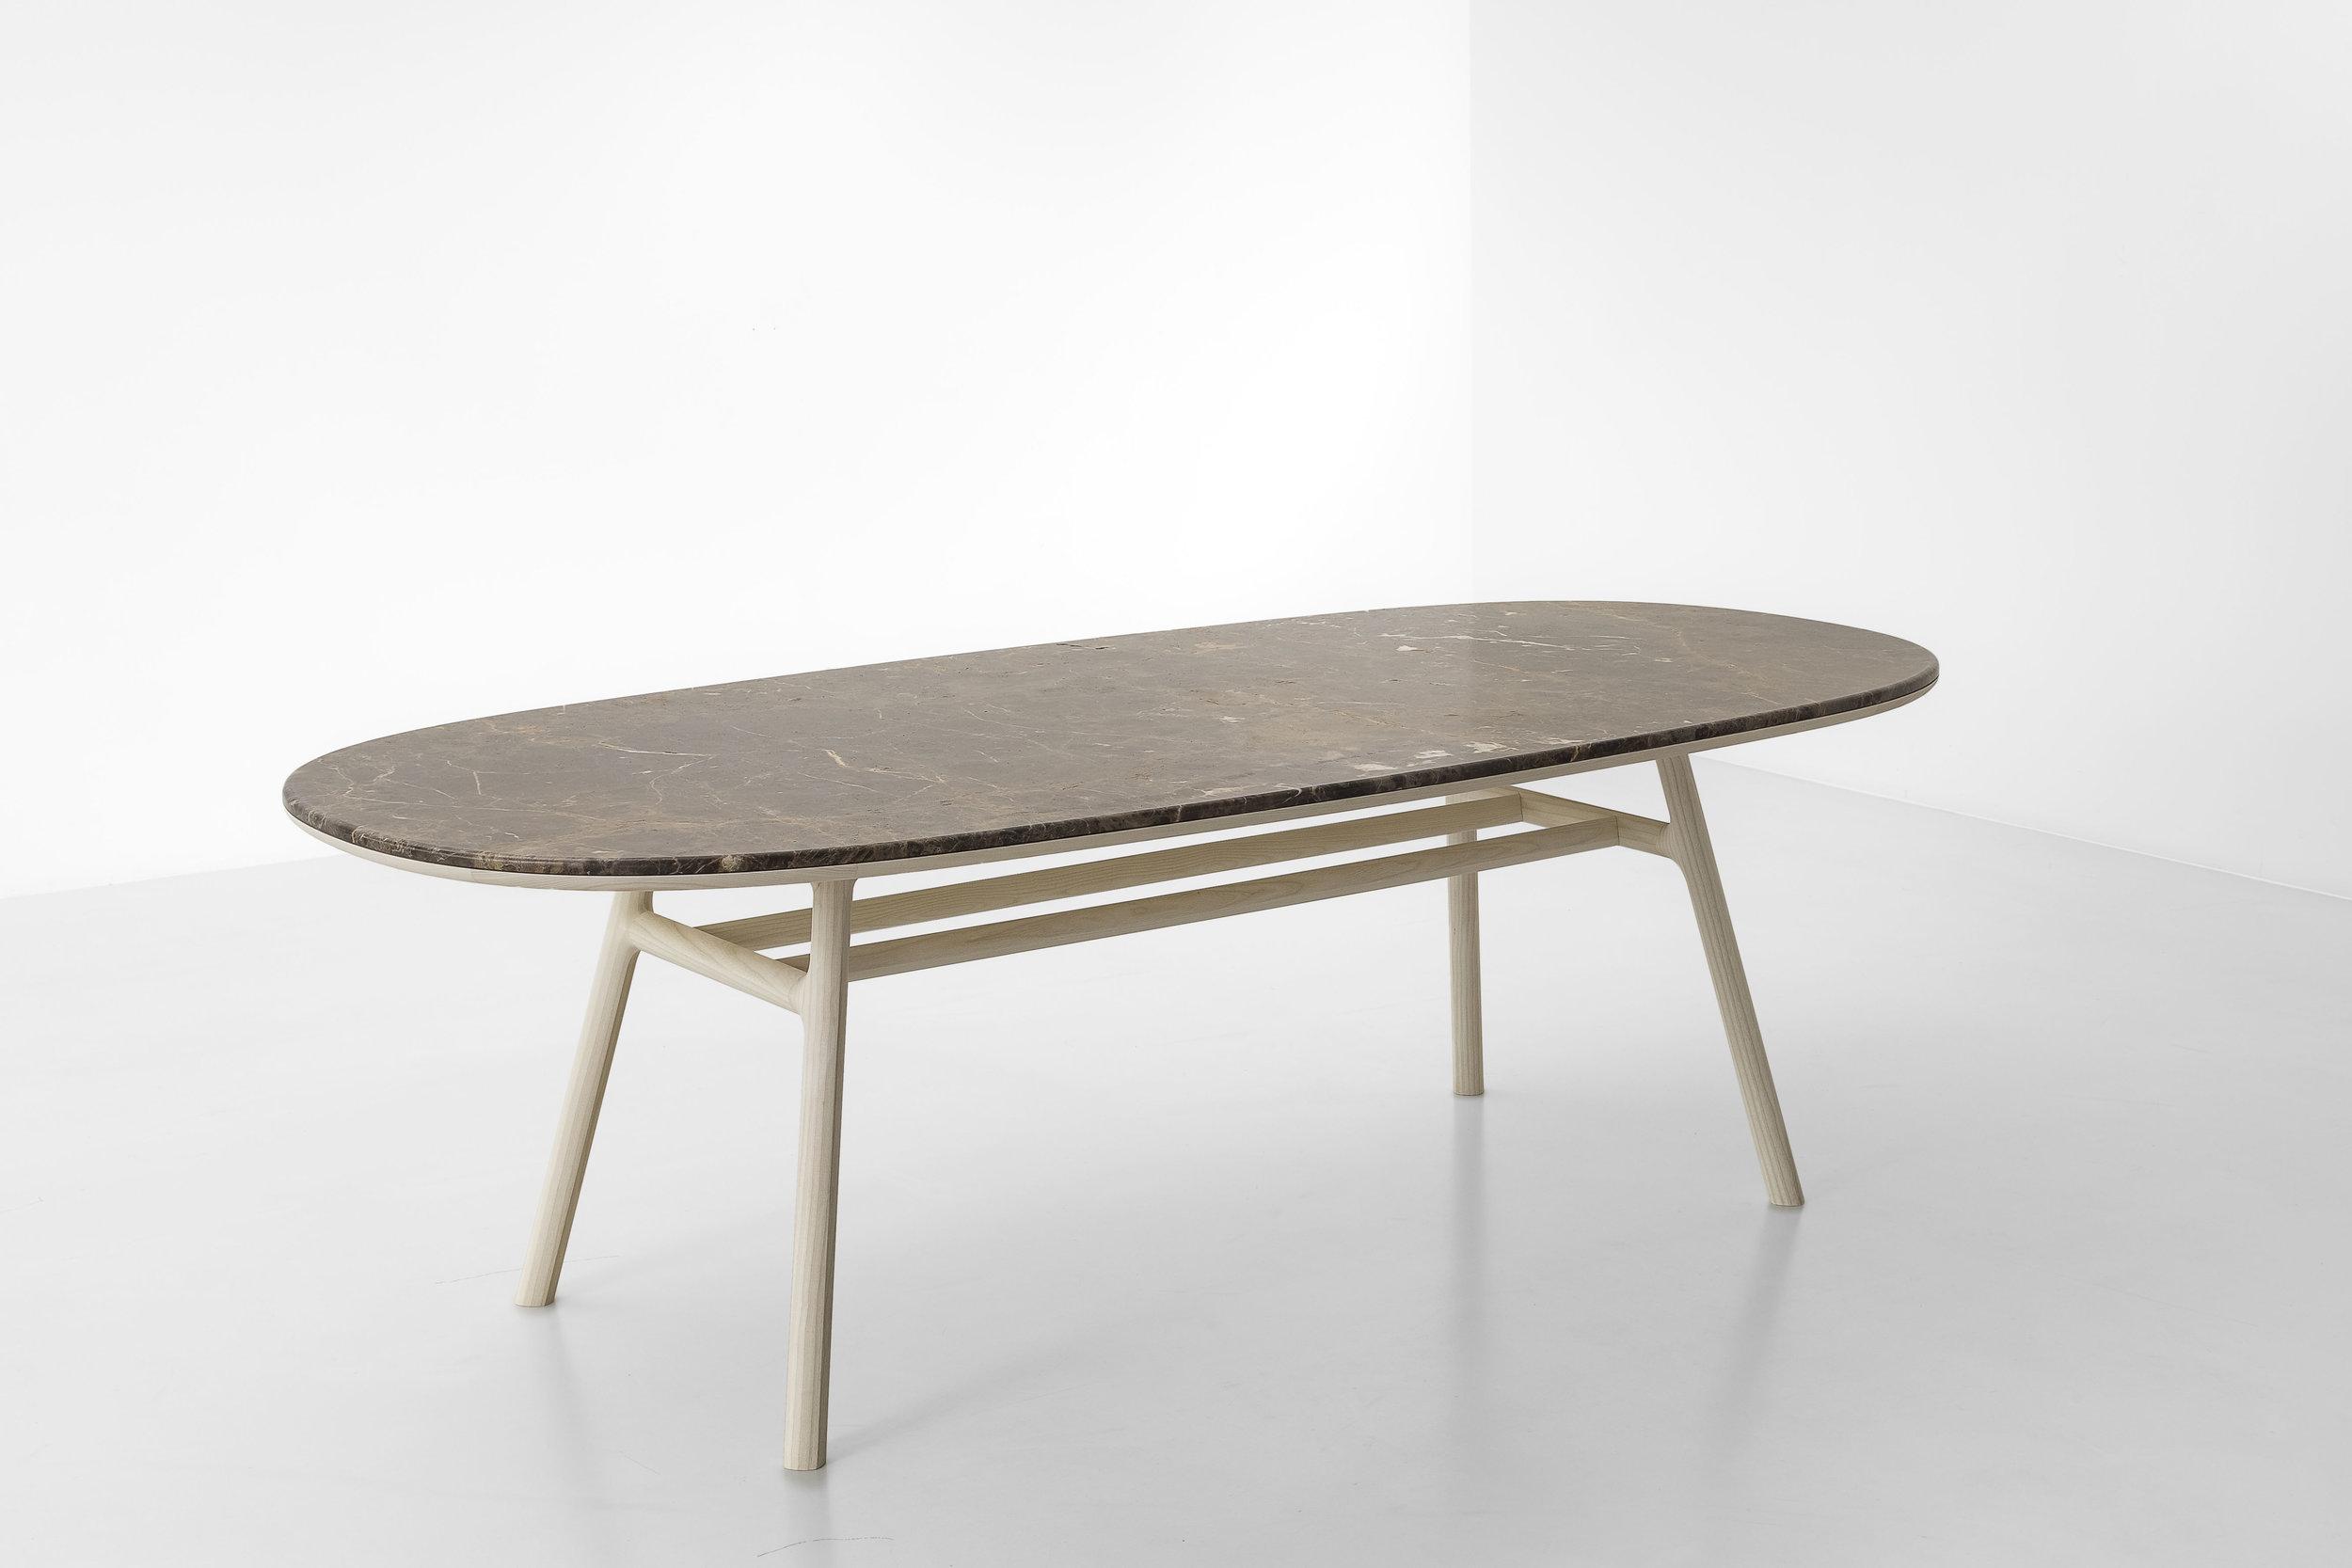 medeo-table_furniture-design_coordination-berlin_02.jpg